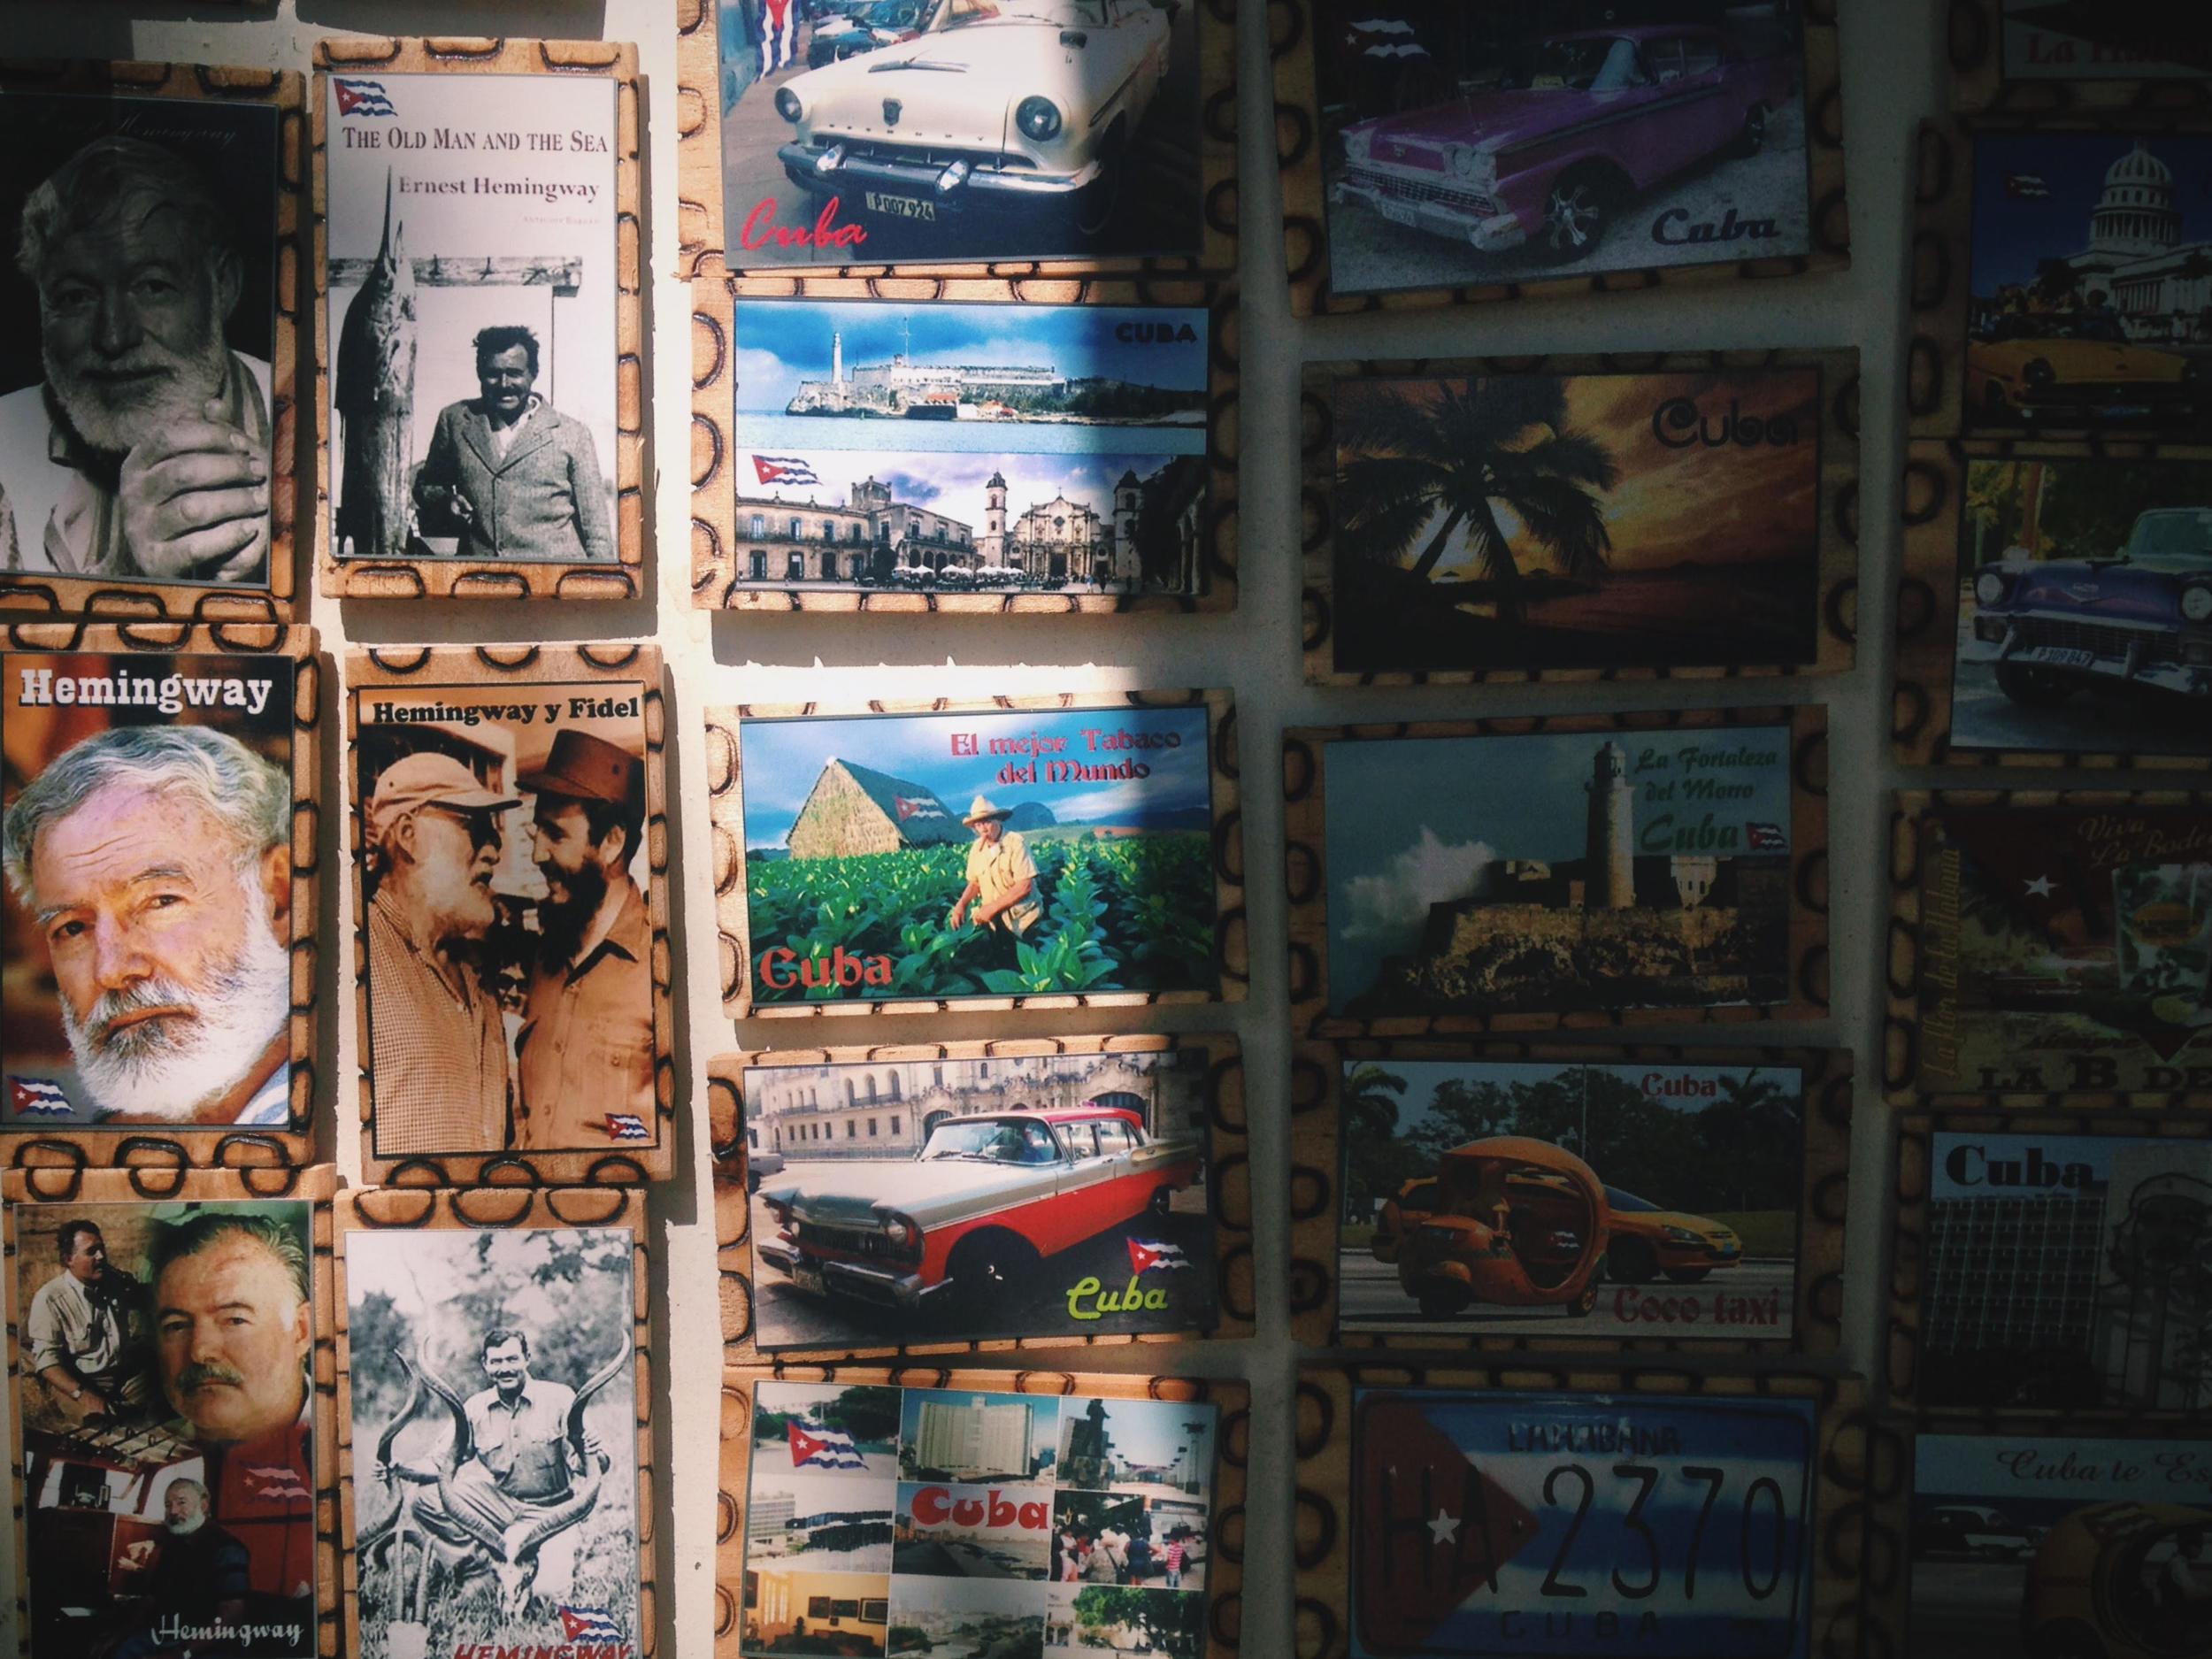 a havana giftshop offers up magnets, including one that features american novelist ernest hemingway alongside former cuban president fidel castro. photo credit: meghan dhaliwal for the alignist.